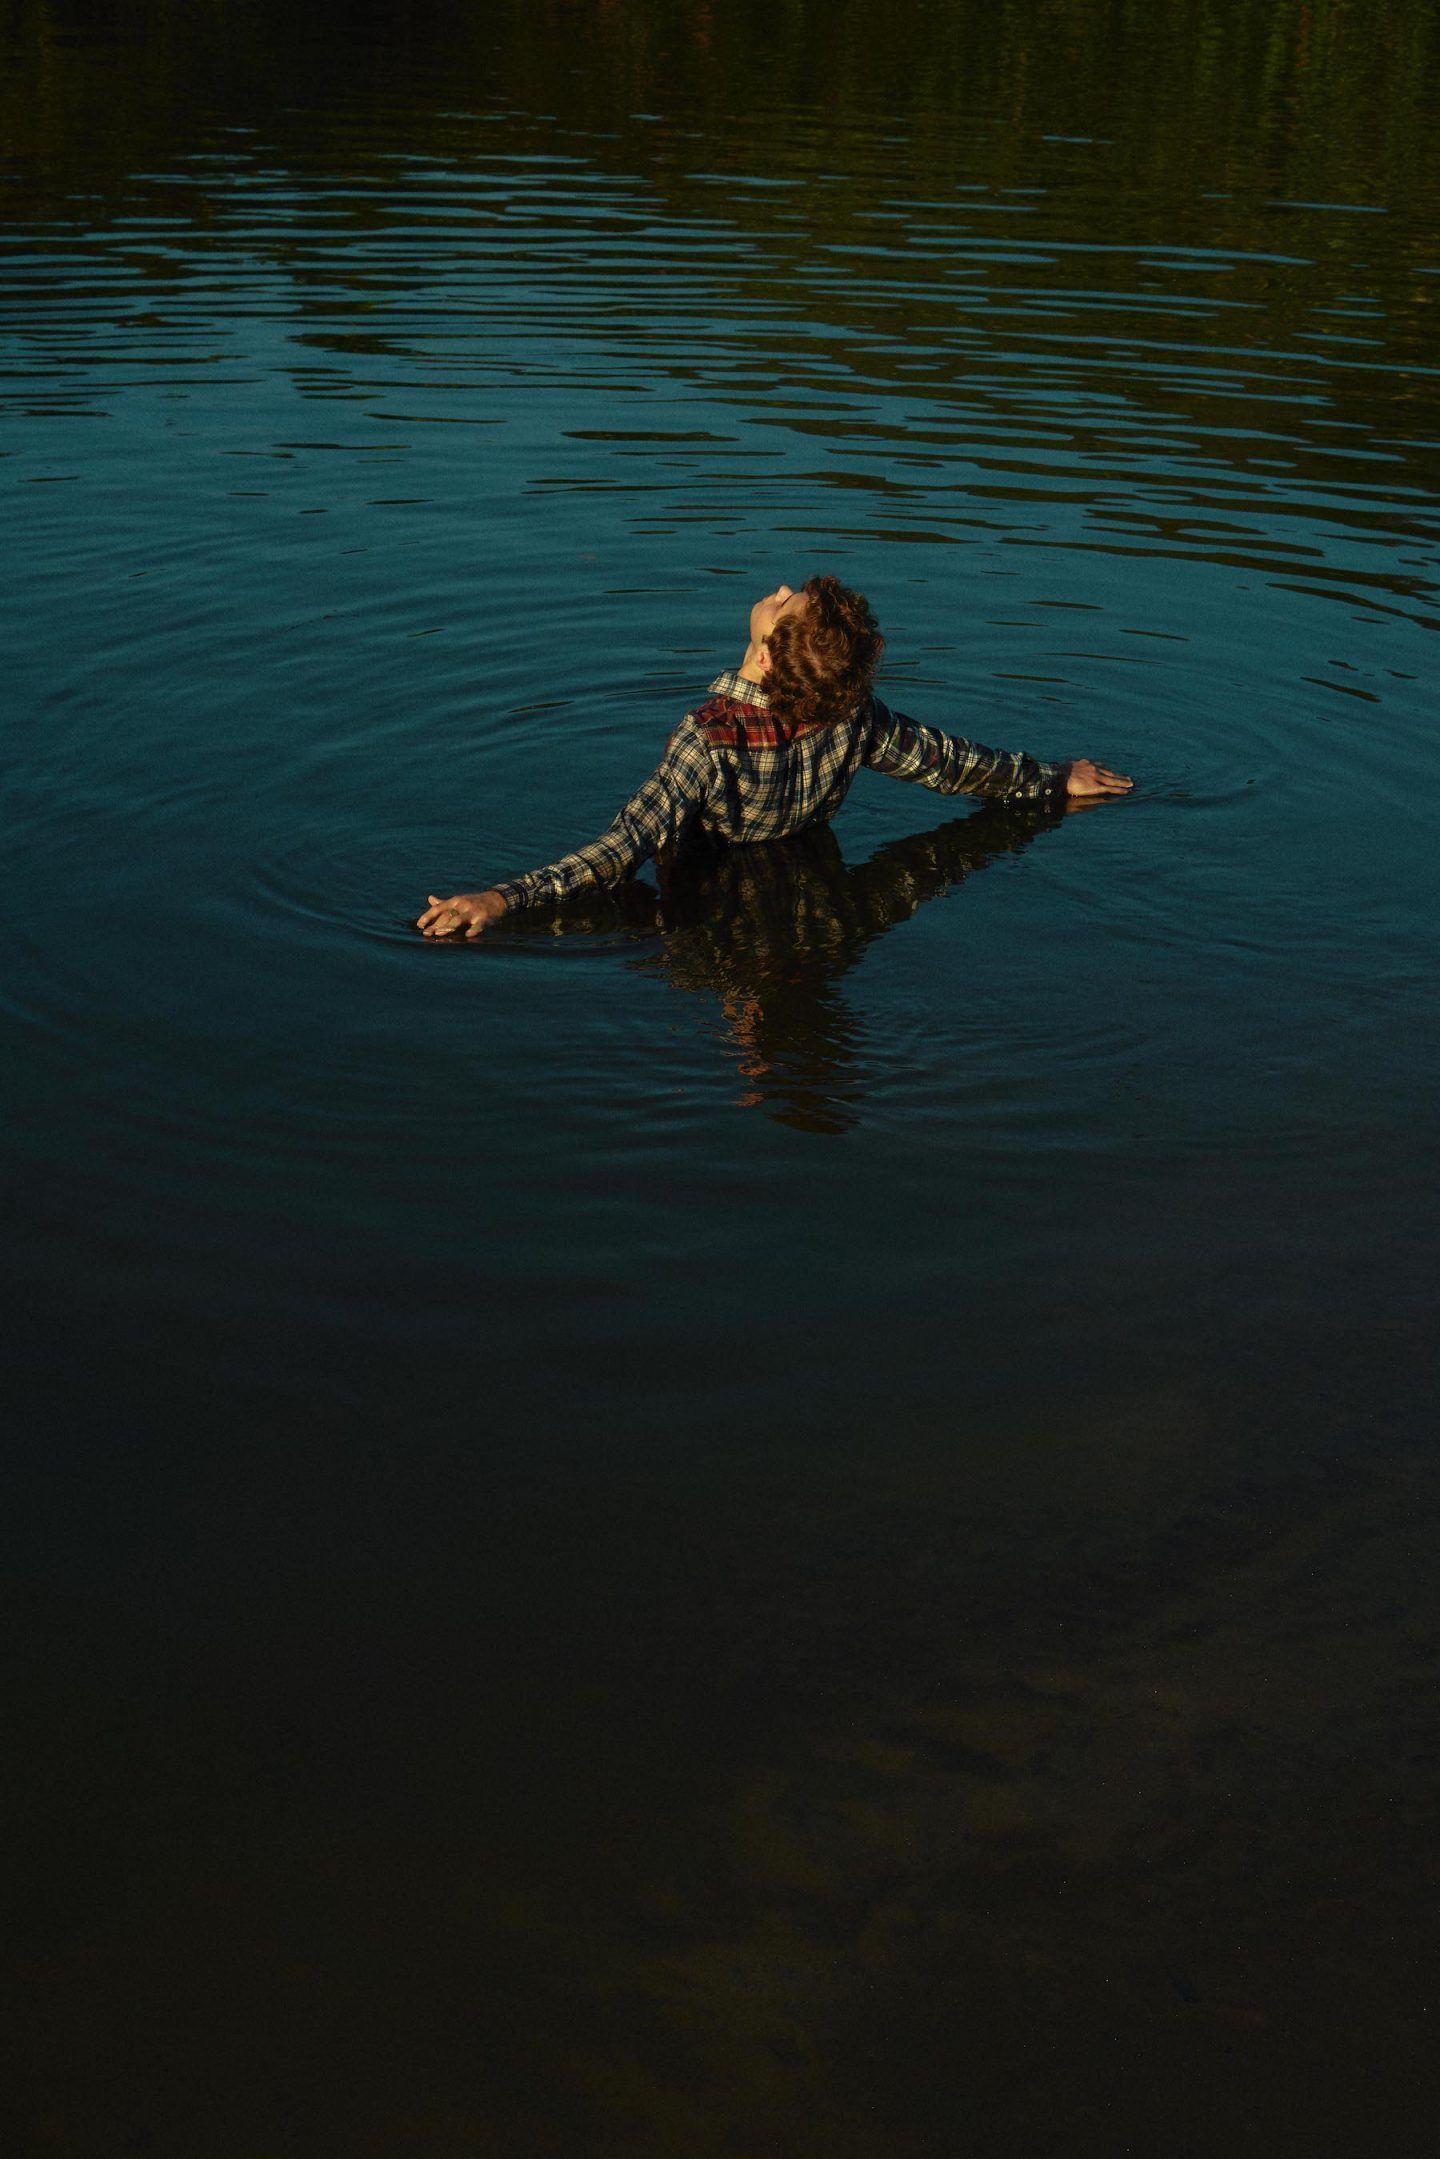 IGNANT-Photography-Michael-Willian-10